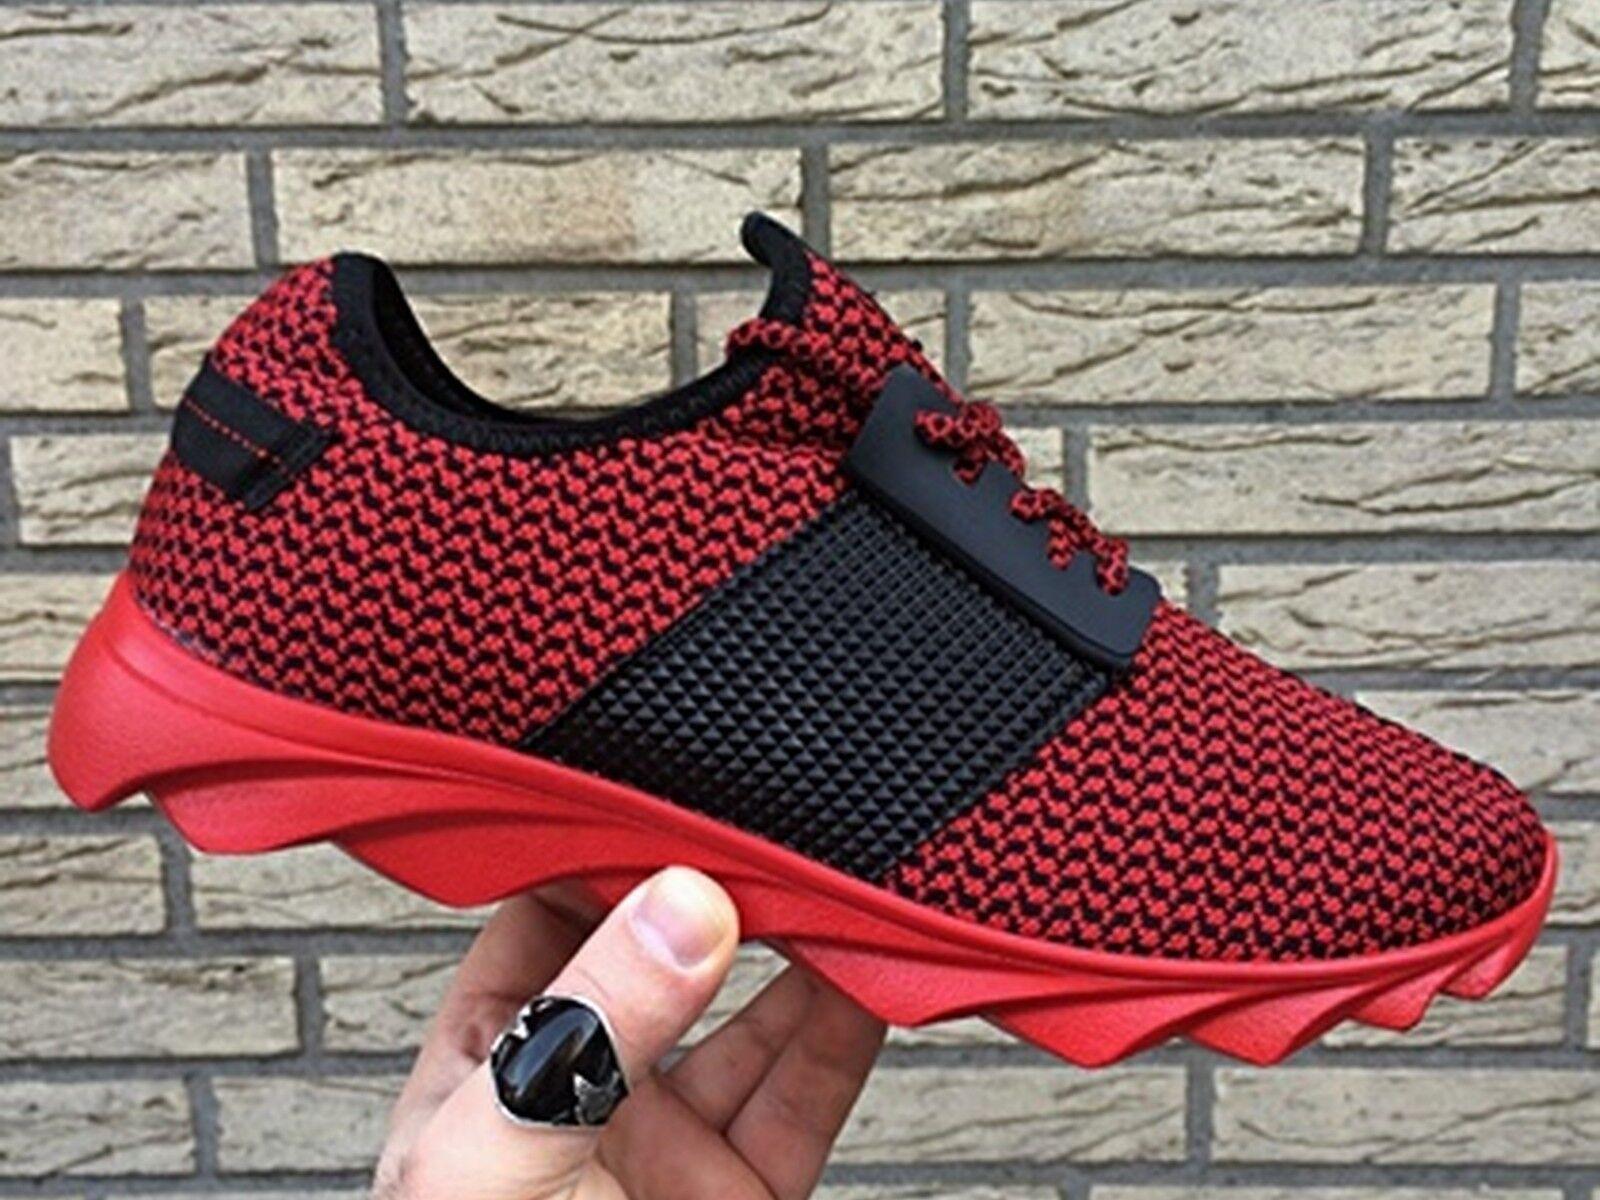 UK Streetstyle Body Fitness Jogging zapatos zapatilla de deporte zapatos Sports Training